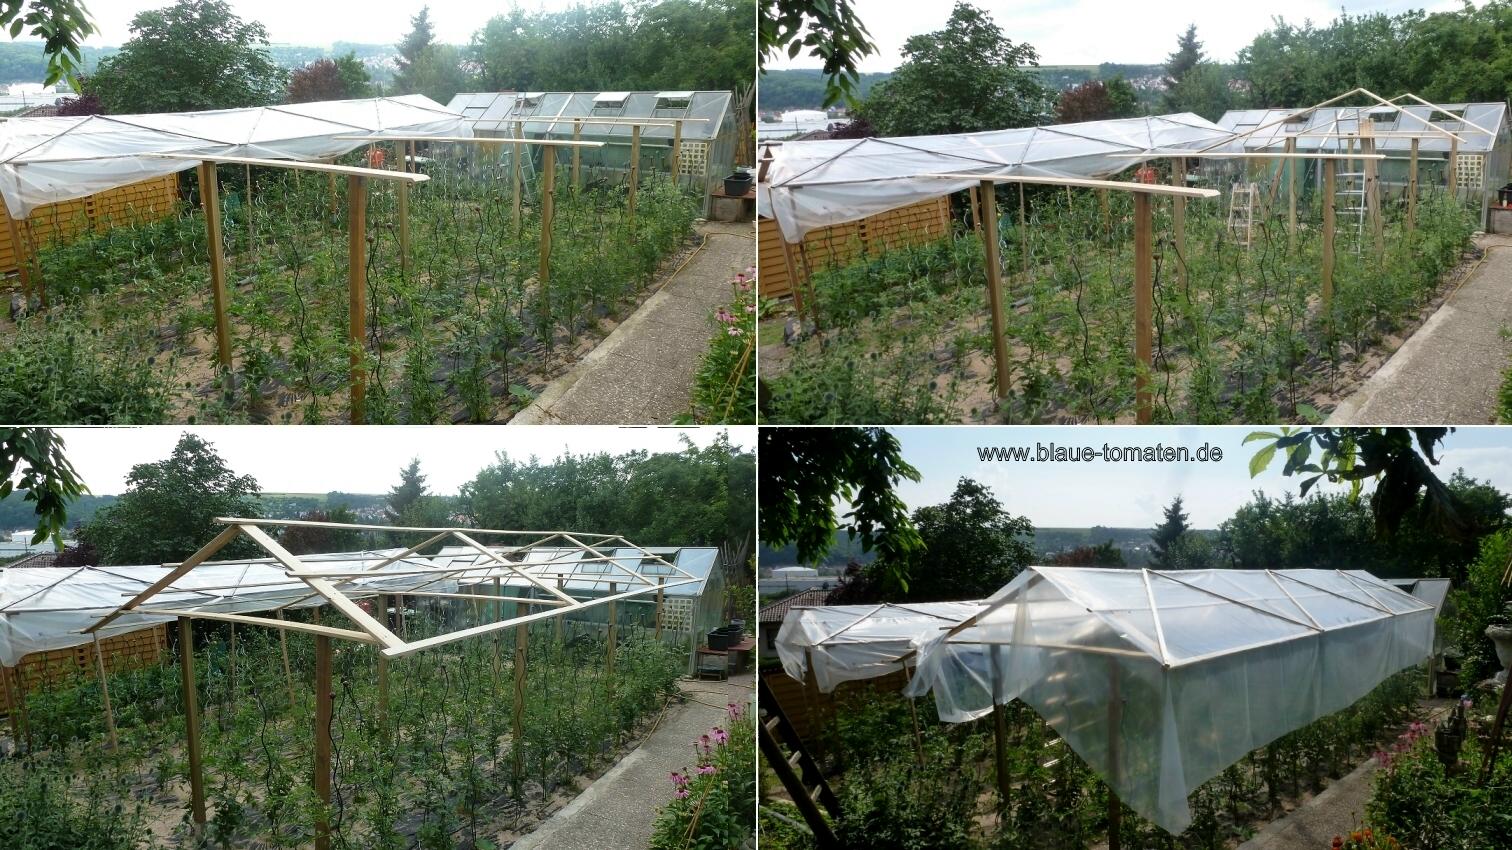 kleiner gem sek nig tomatendach tomatenhaus bauen. Black Bedroom Furniture Sets. Home Design Ideas